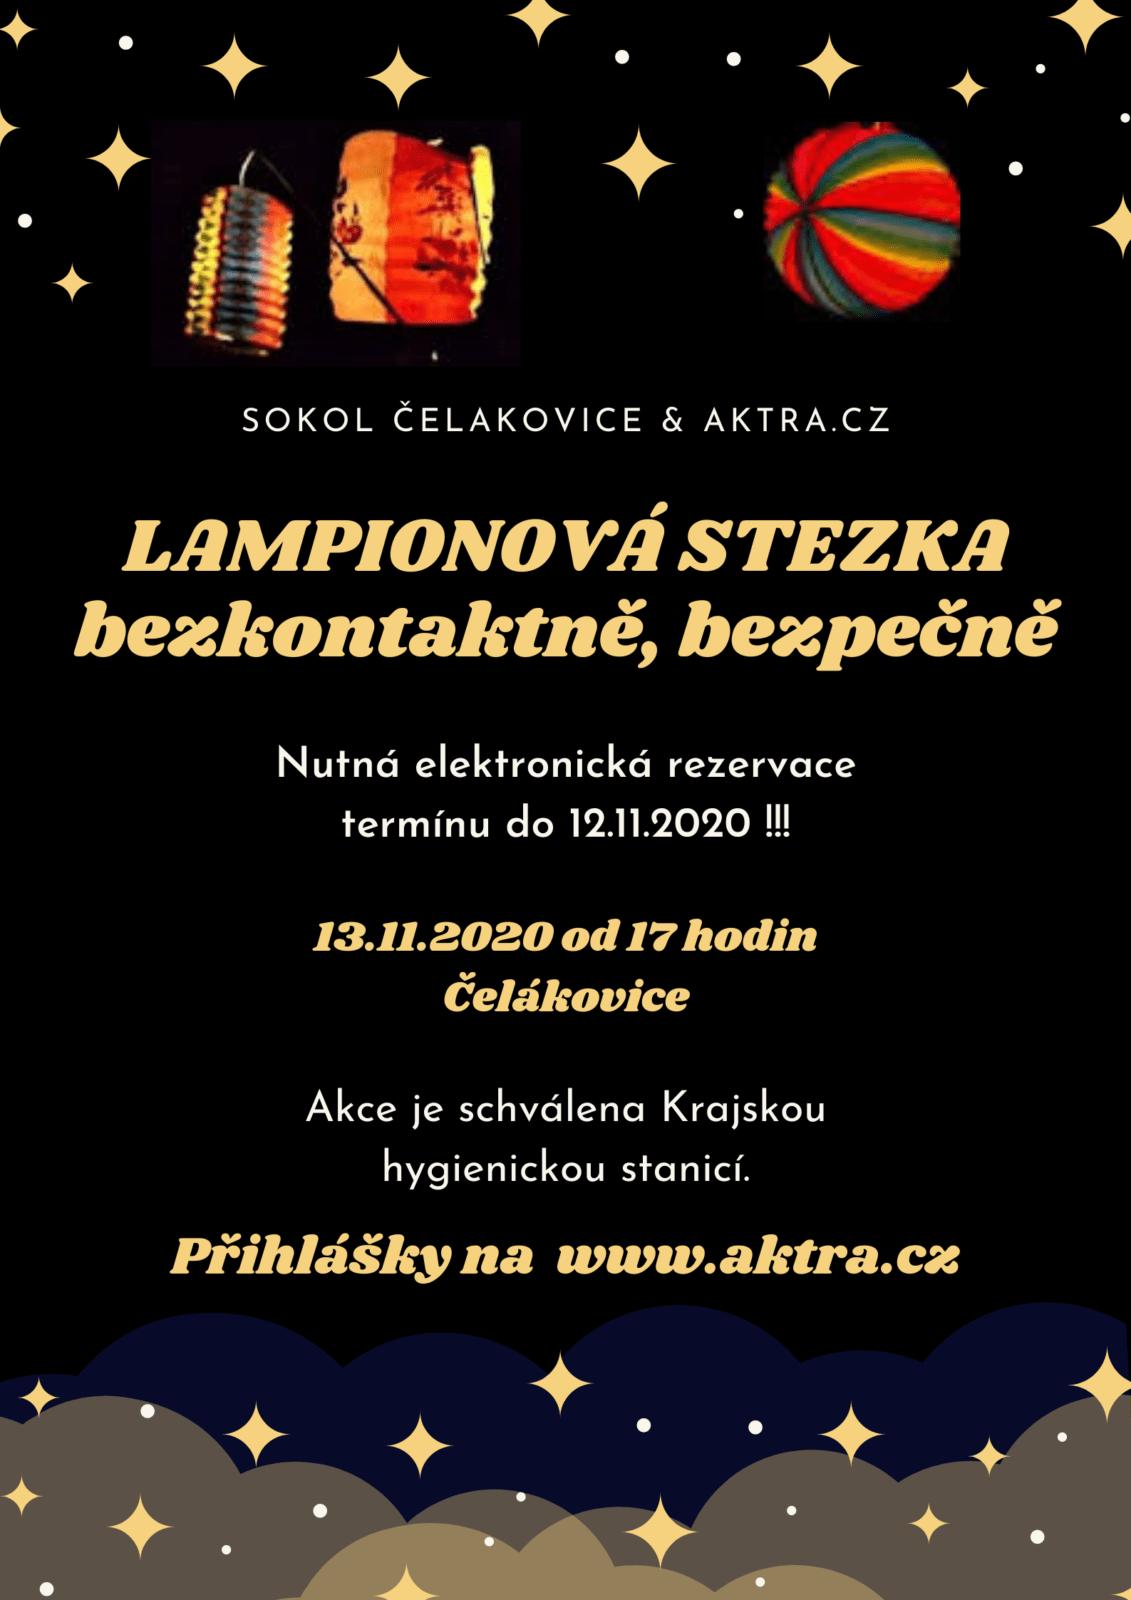 LampionovaStezka2020